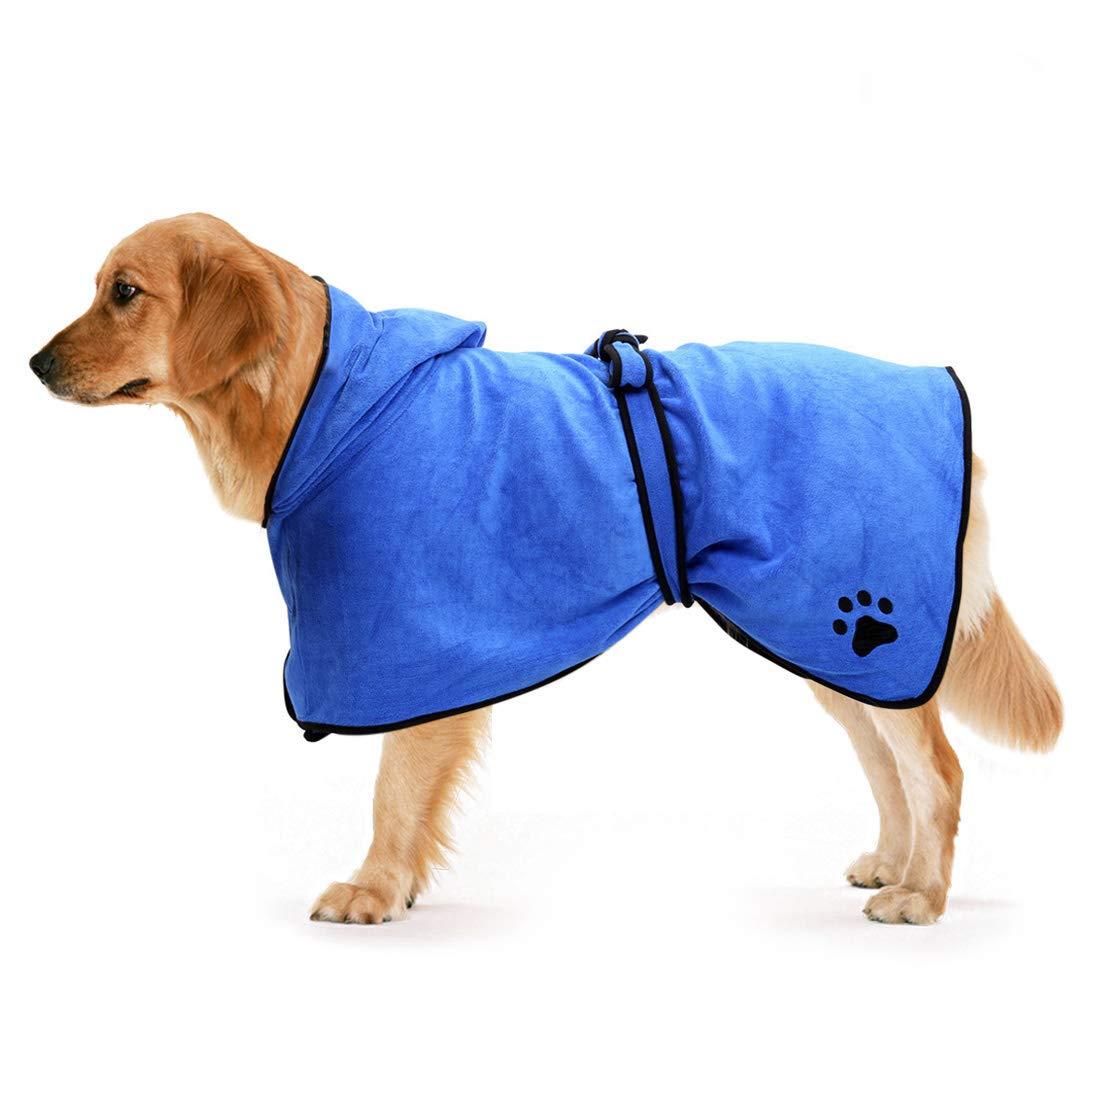 Zellar Dog Bathrobe Towel with Adjustable Strap Hood, Microfibre Fast Drying Super Absorbent Pet Dog Cat Bath Robe Towel for Drying Coats, Large, Blue